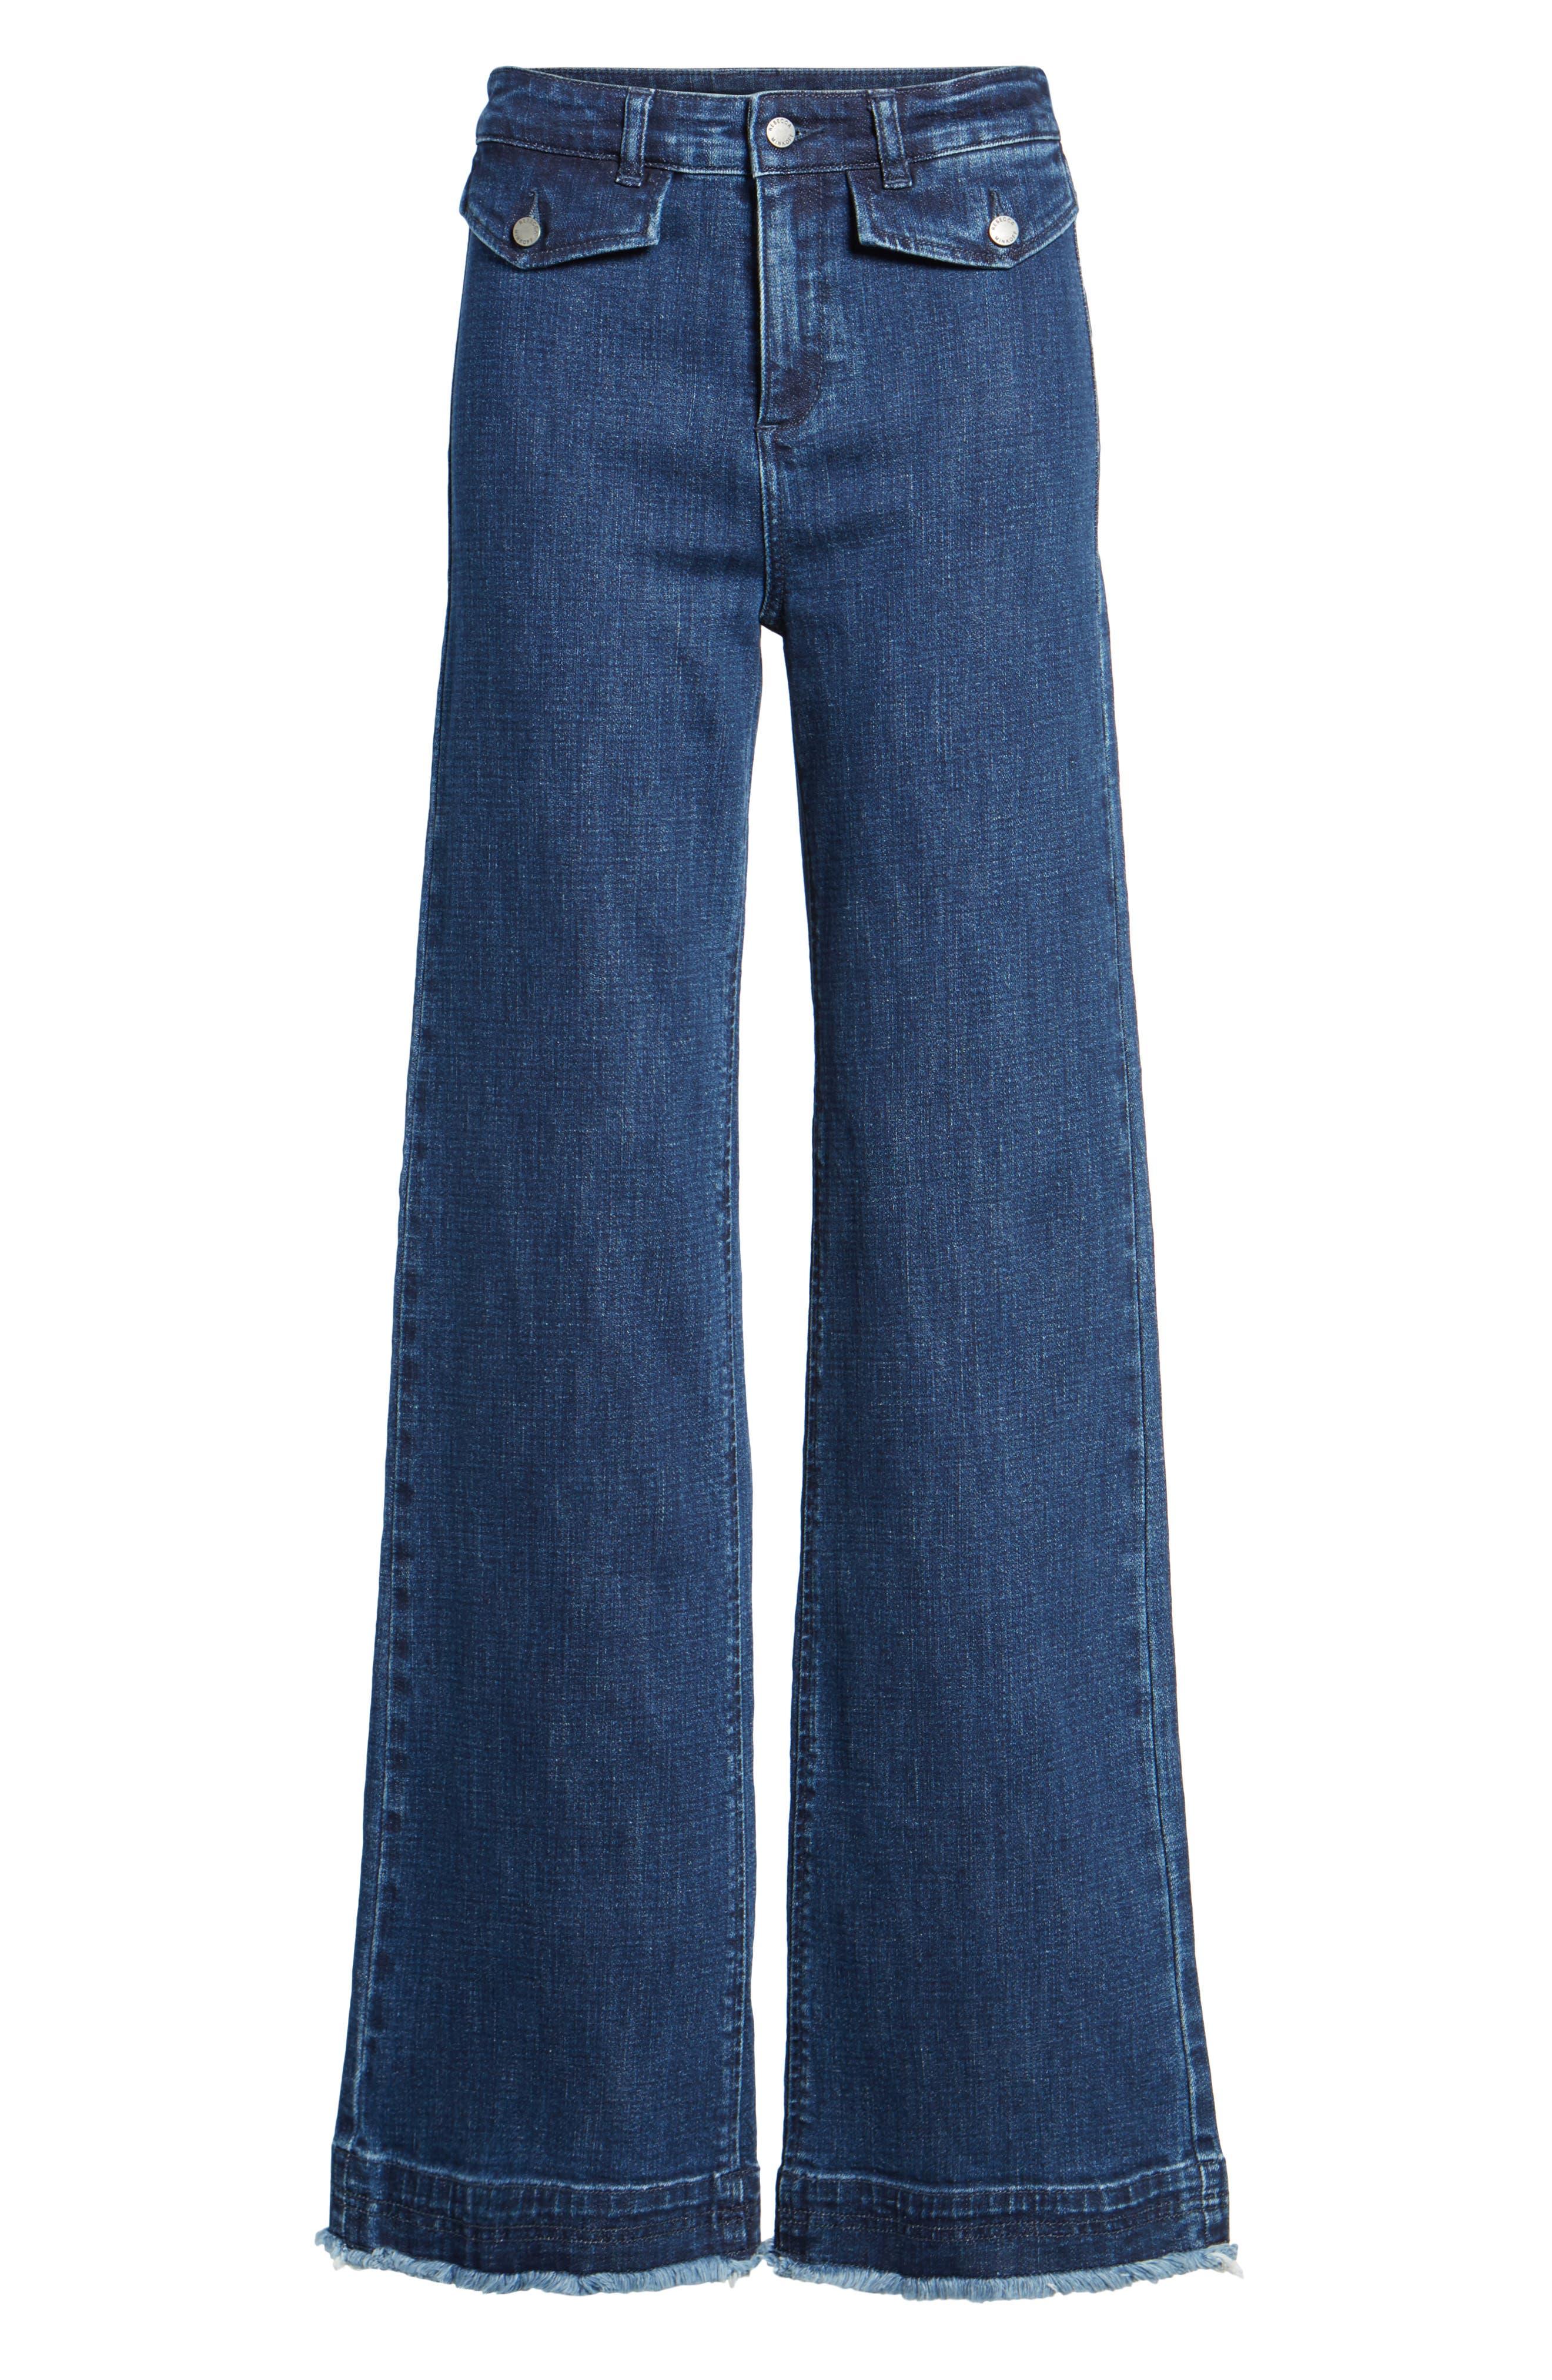 Elwood Wide Leg Jeans,                             Alternate thumbnail 6, color,                             INDIGO